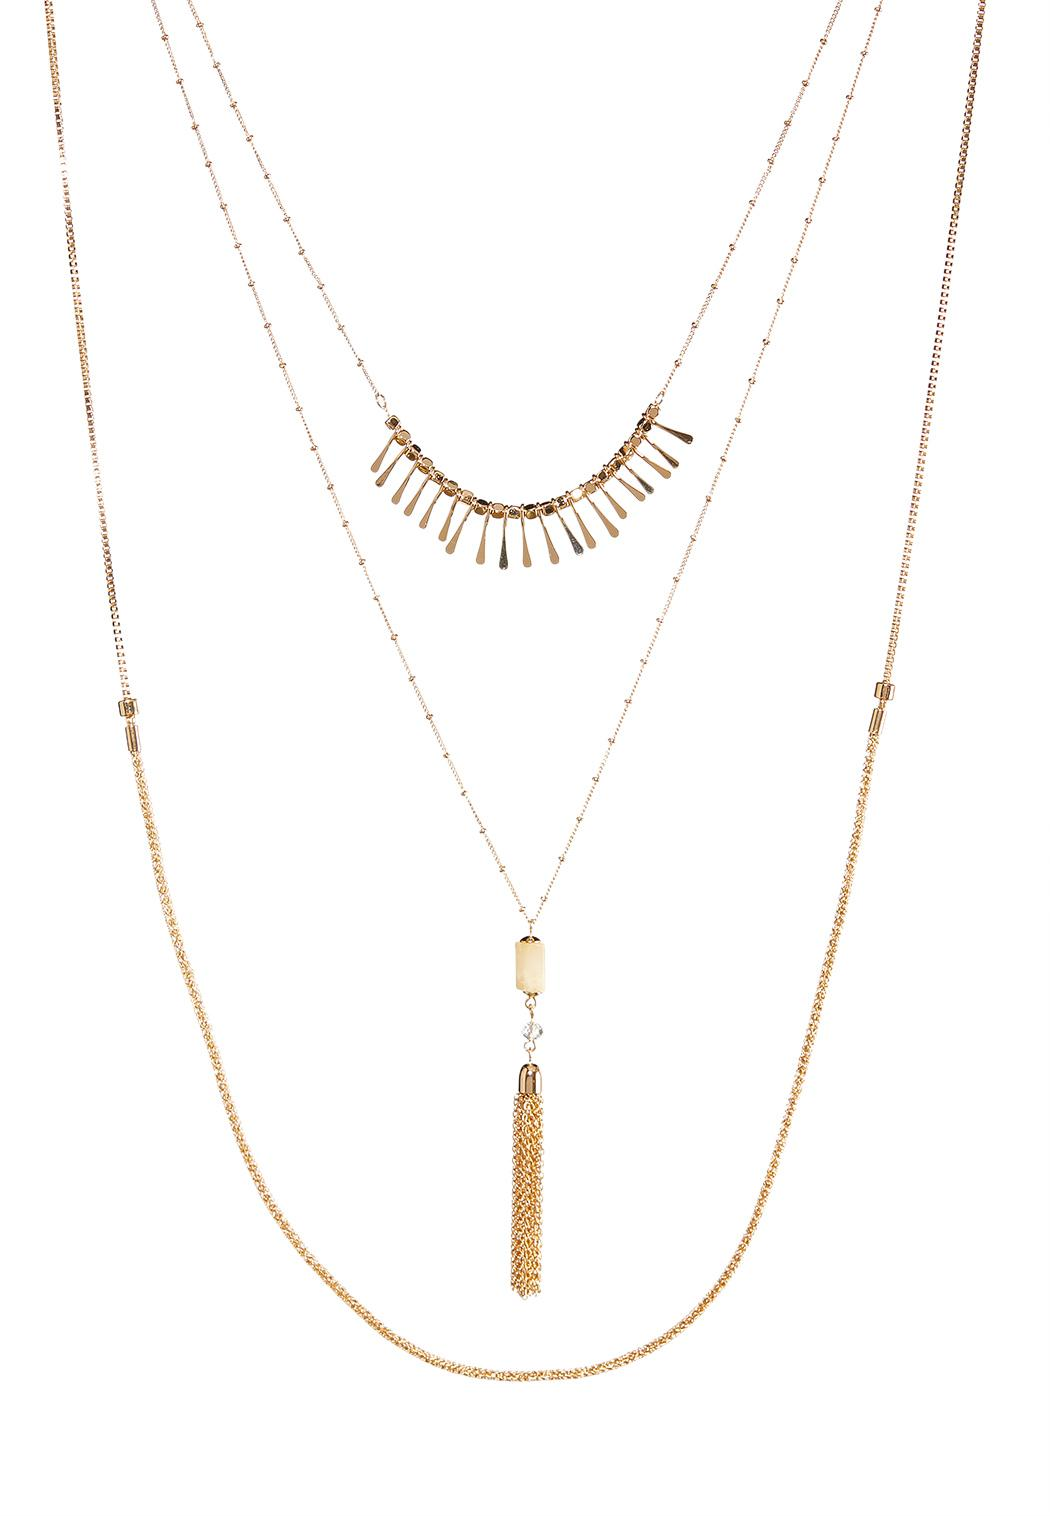 Triple Layered Tassel Necklace